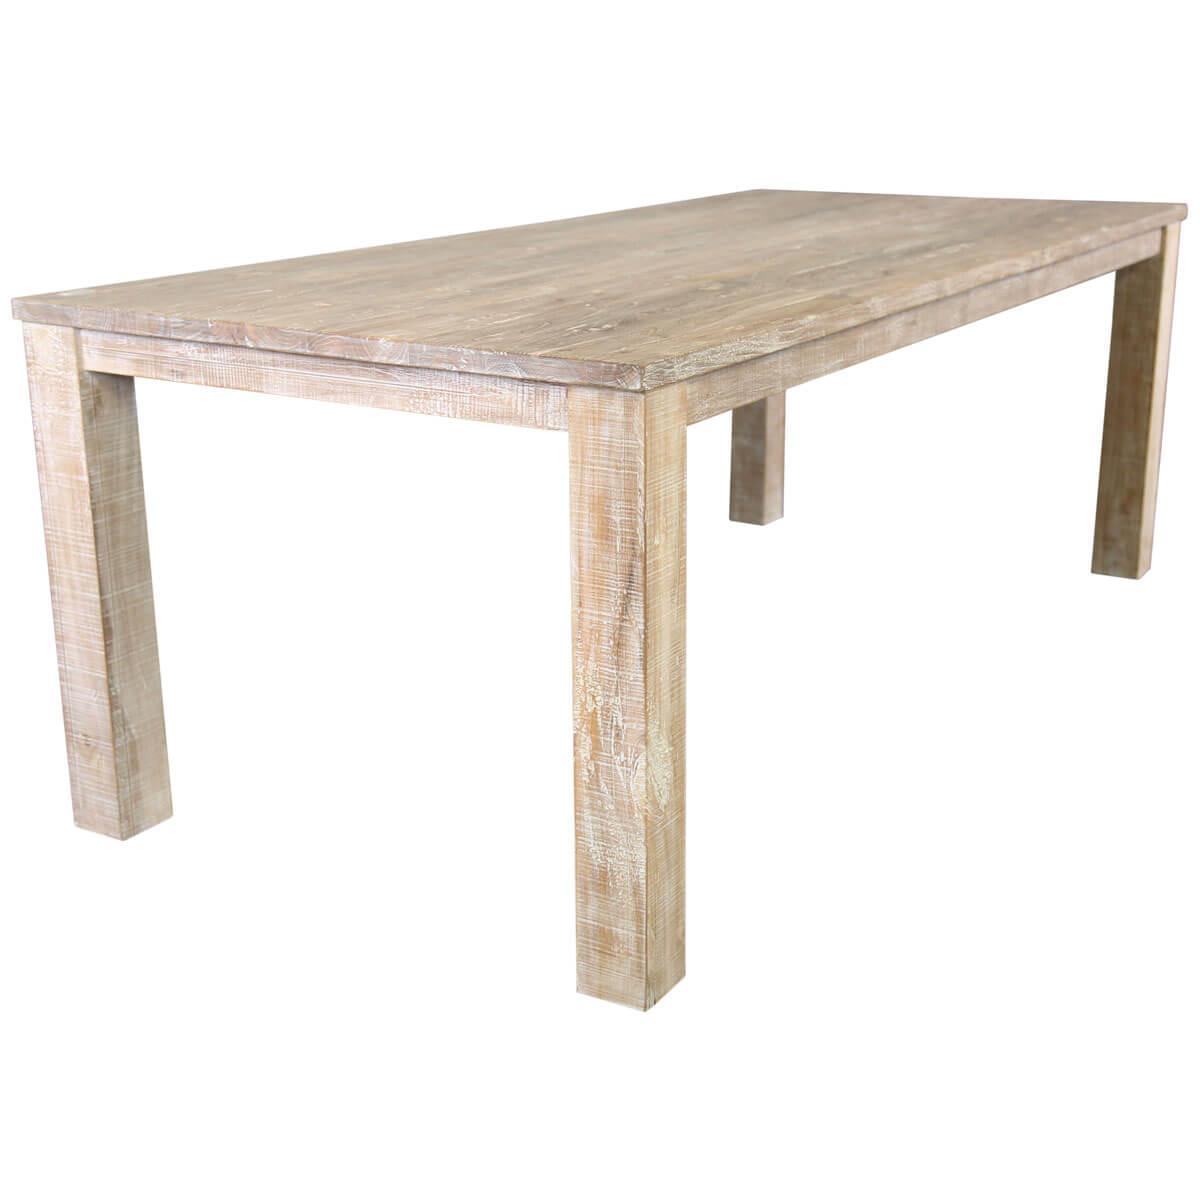 White Wash Wood Dining Table: Durham Handcrafted White Wash Recycled Teak Wood Large